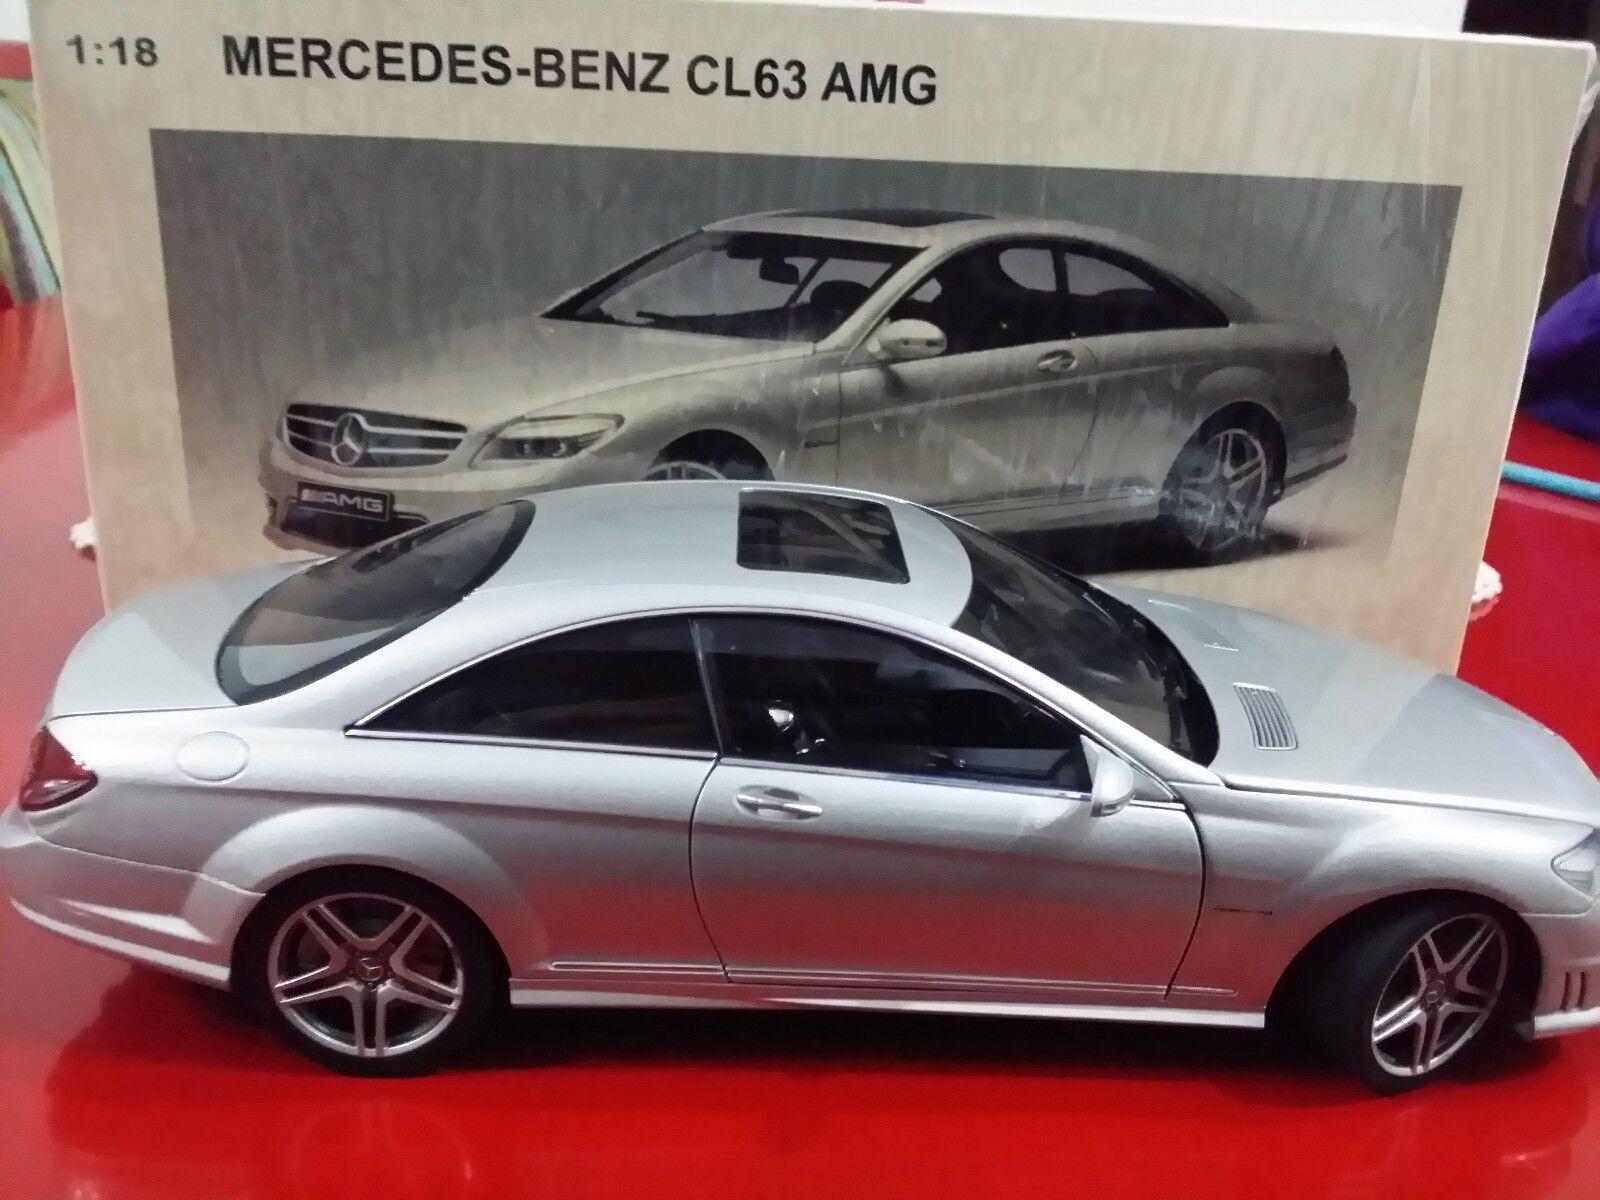 Mercedes benz cl63 amg autoart 1 18